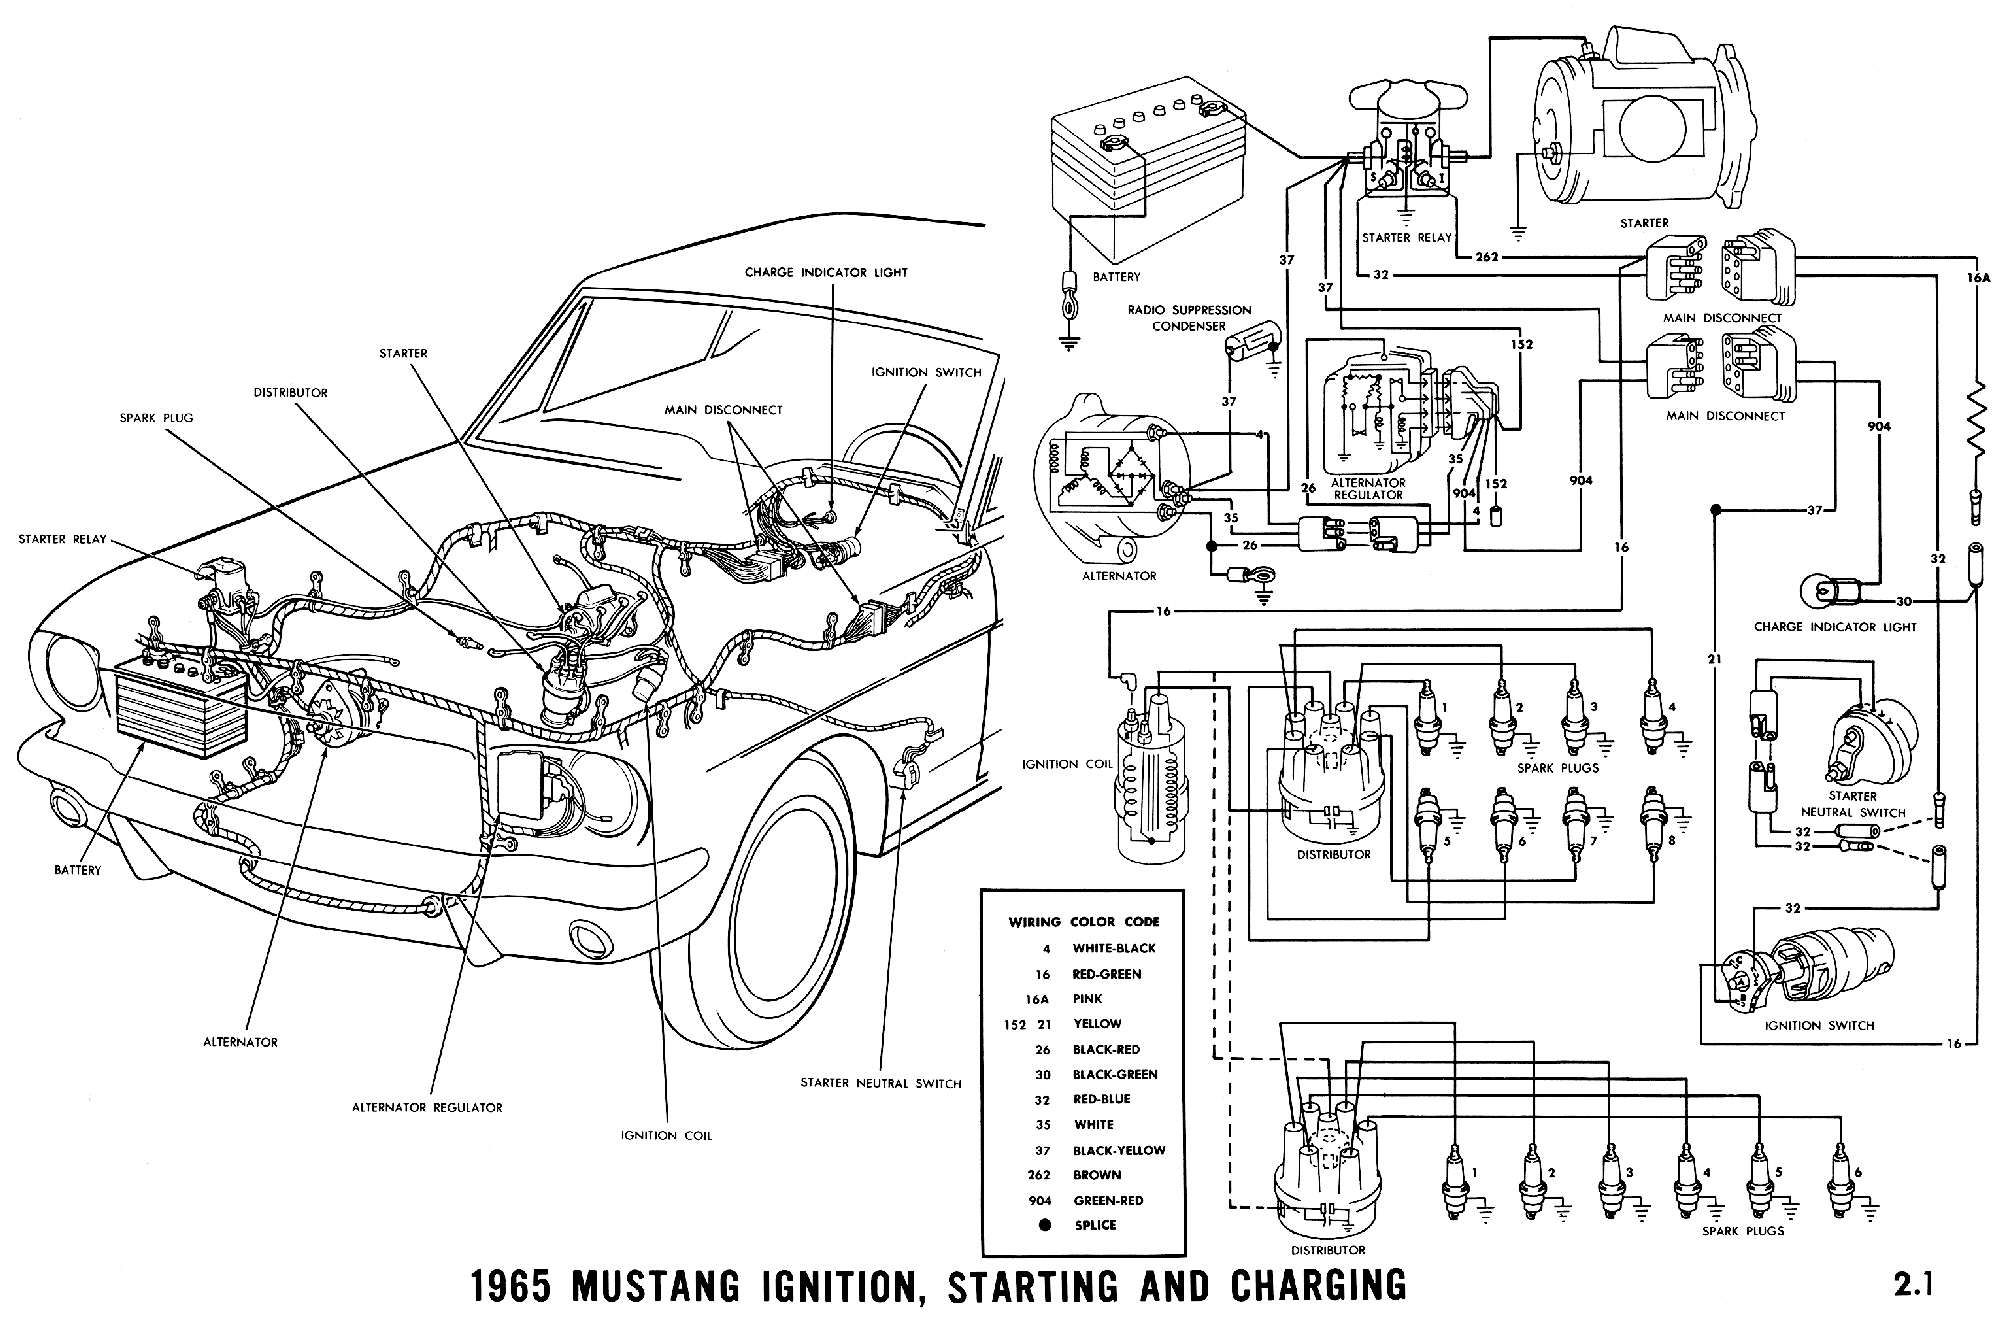 66 mustang wiring diagram pioneer deh 3200ub 1965 diagrams average joe restoration